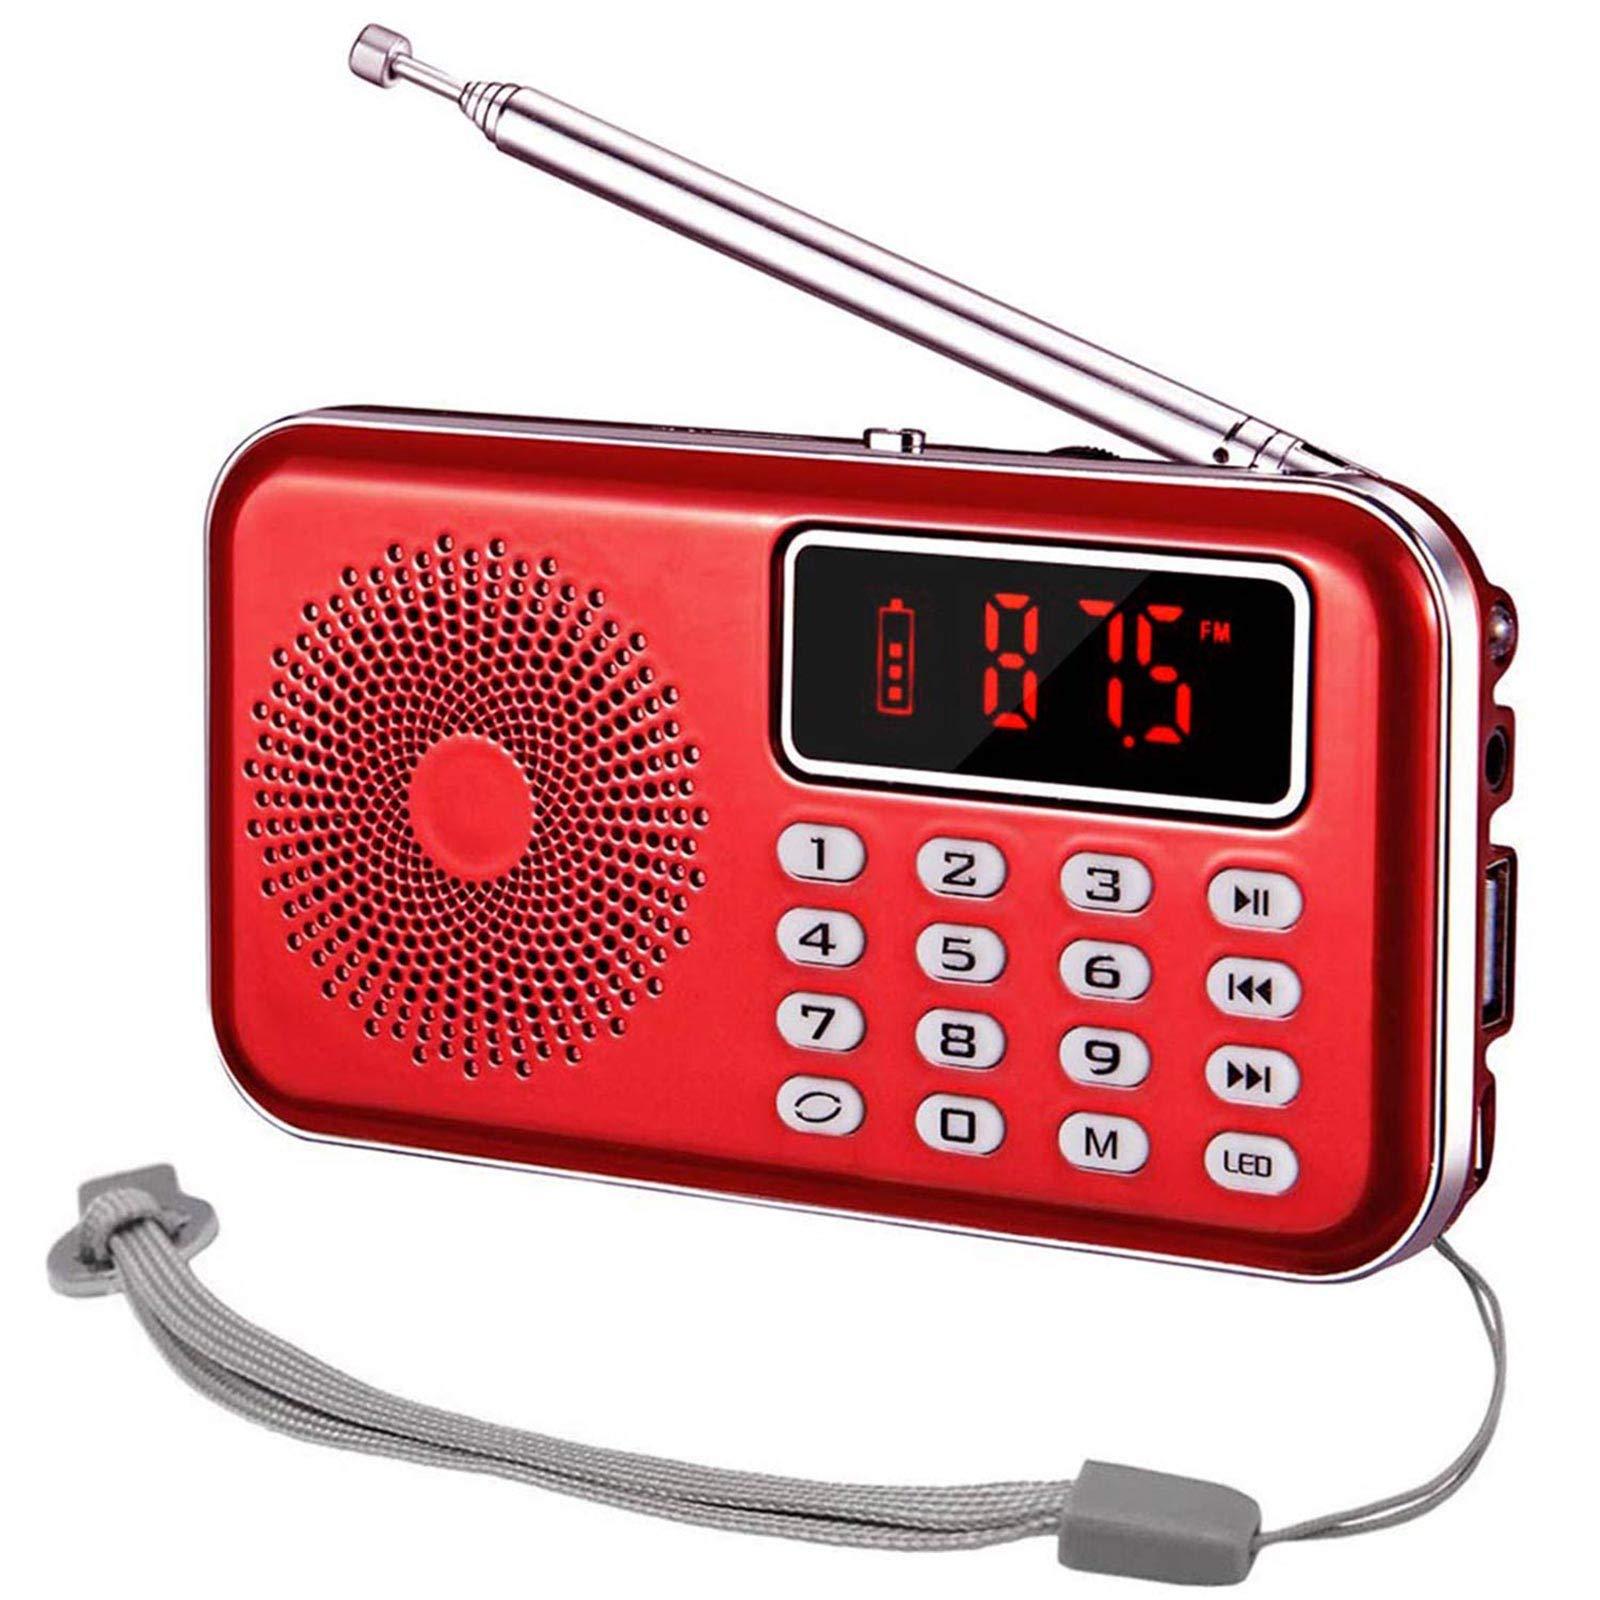 iMinker Mini Radio portátil Digital Am/FM Speaker MP3 Player Soporte TF Tarjeta/USB con Pantalla LED, Linterna, Batería Recargable, Auriculares Jack (Rojo): Amazon.es: Electrónica